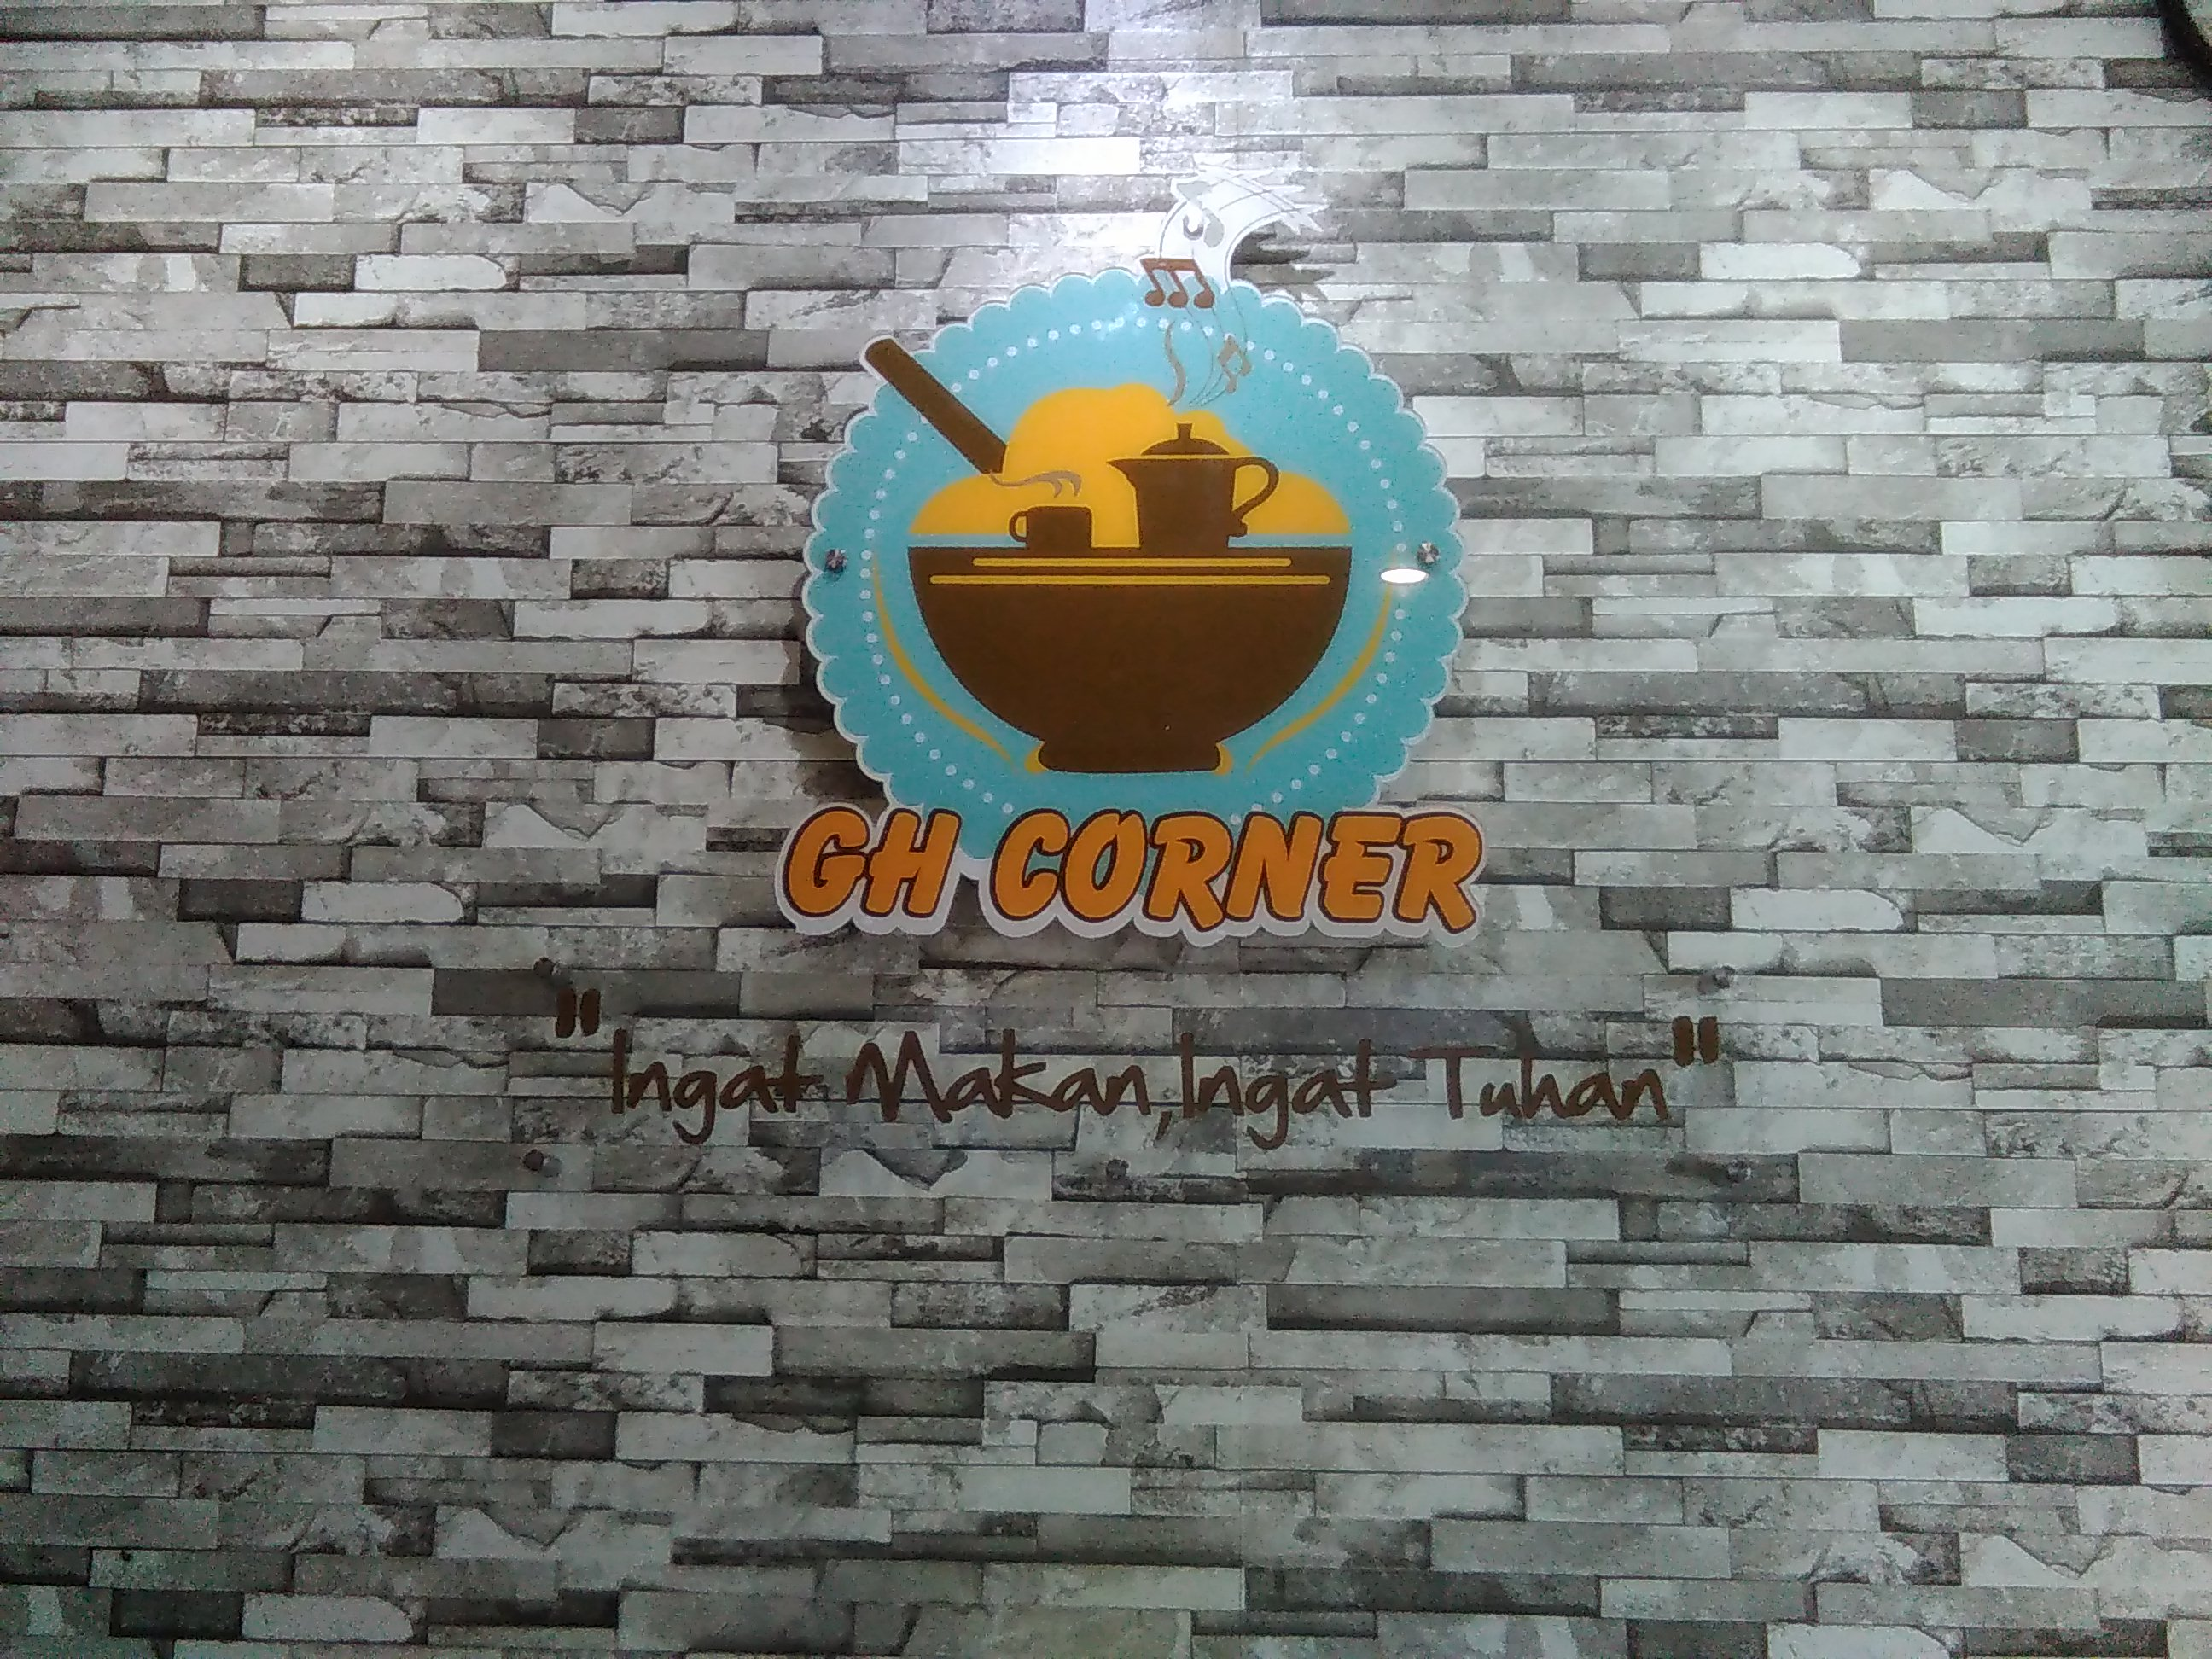 GH Corner Jogja